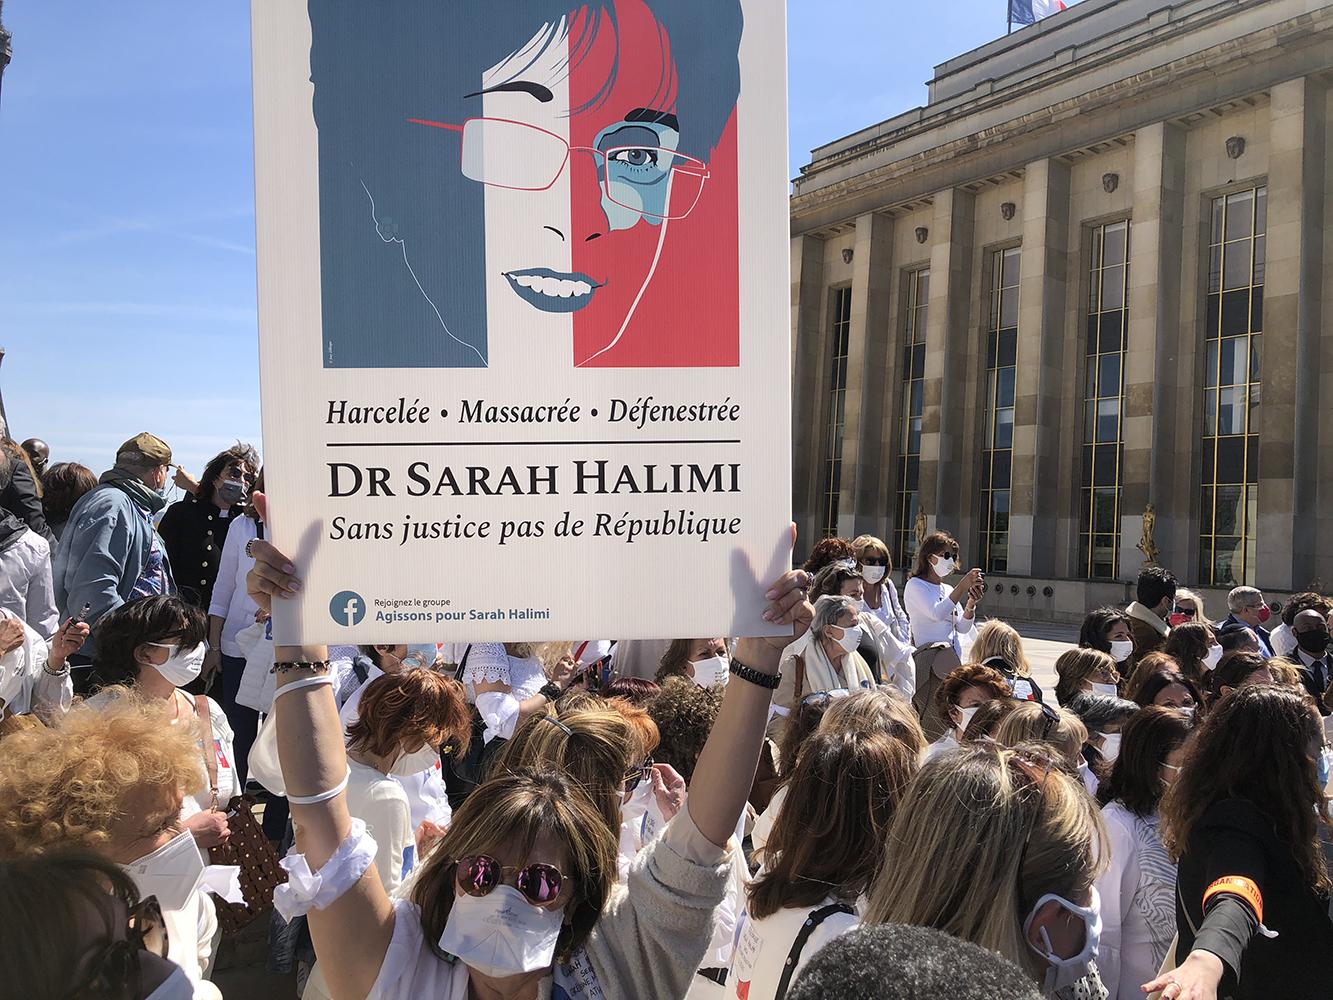 Paris rally for Sarah Halimi - 4